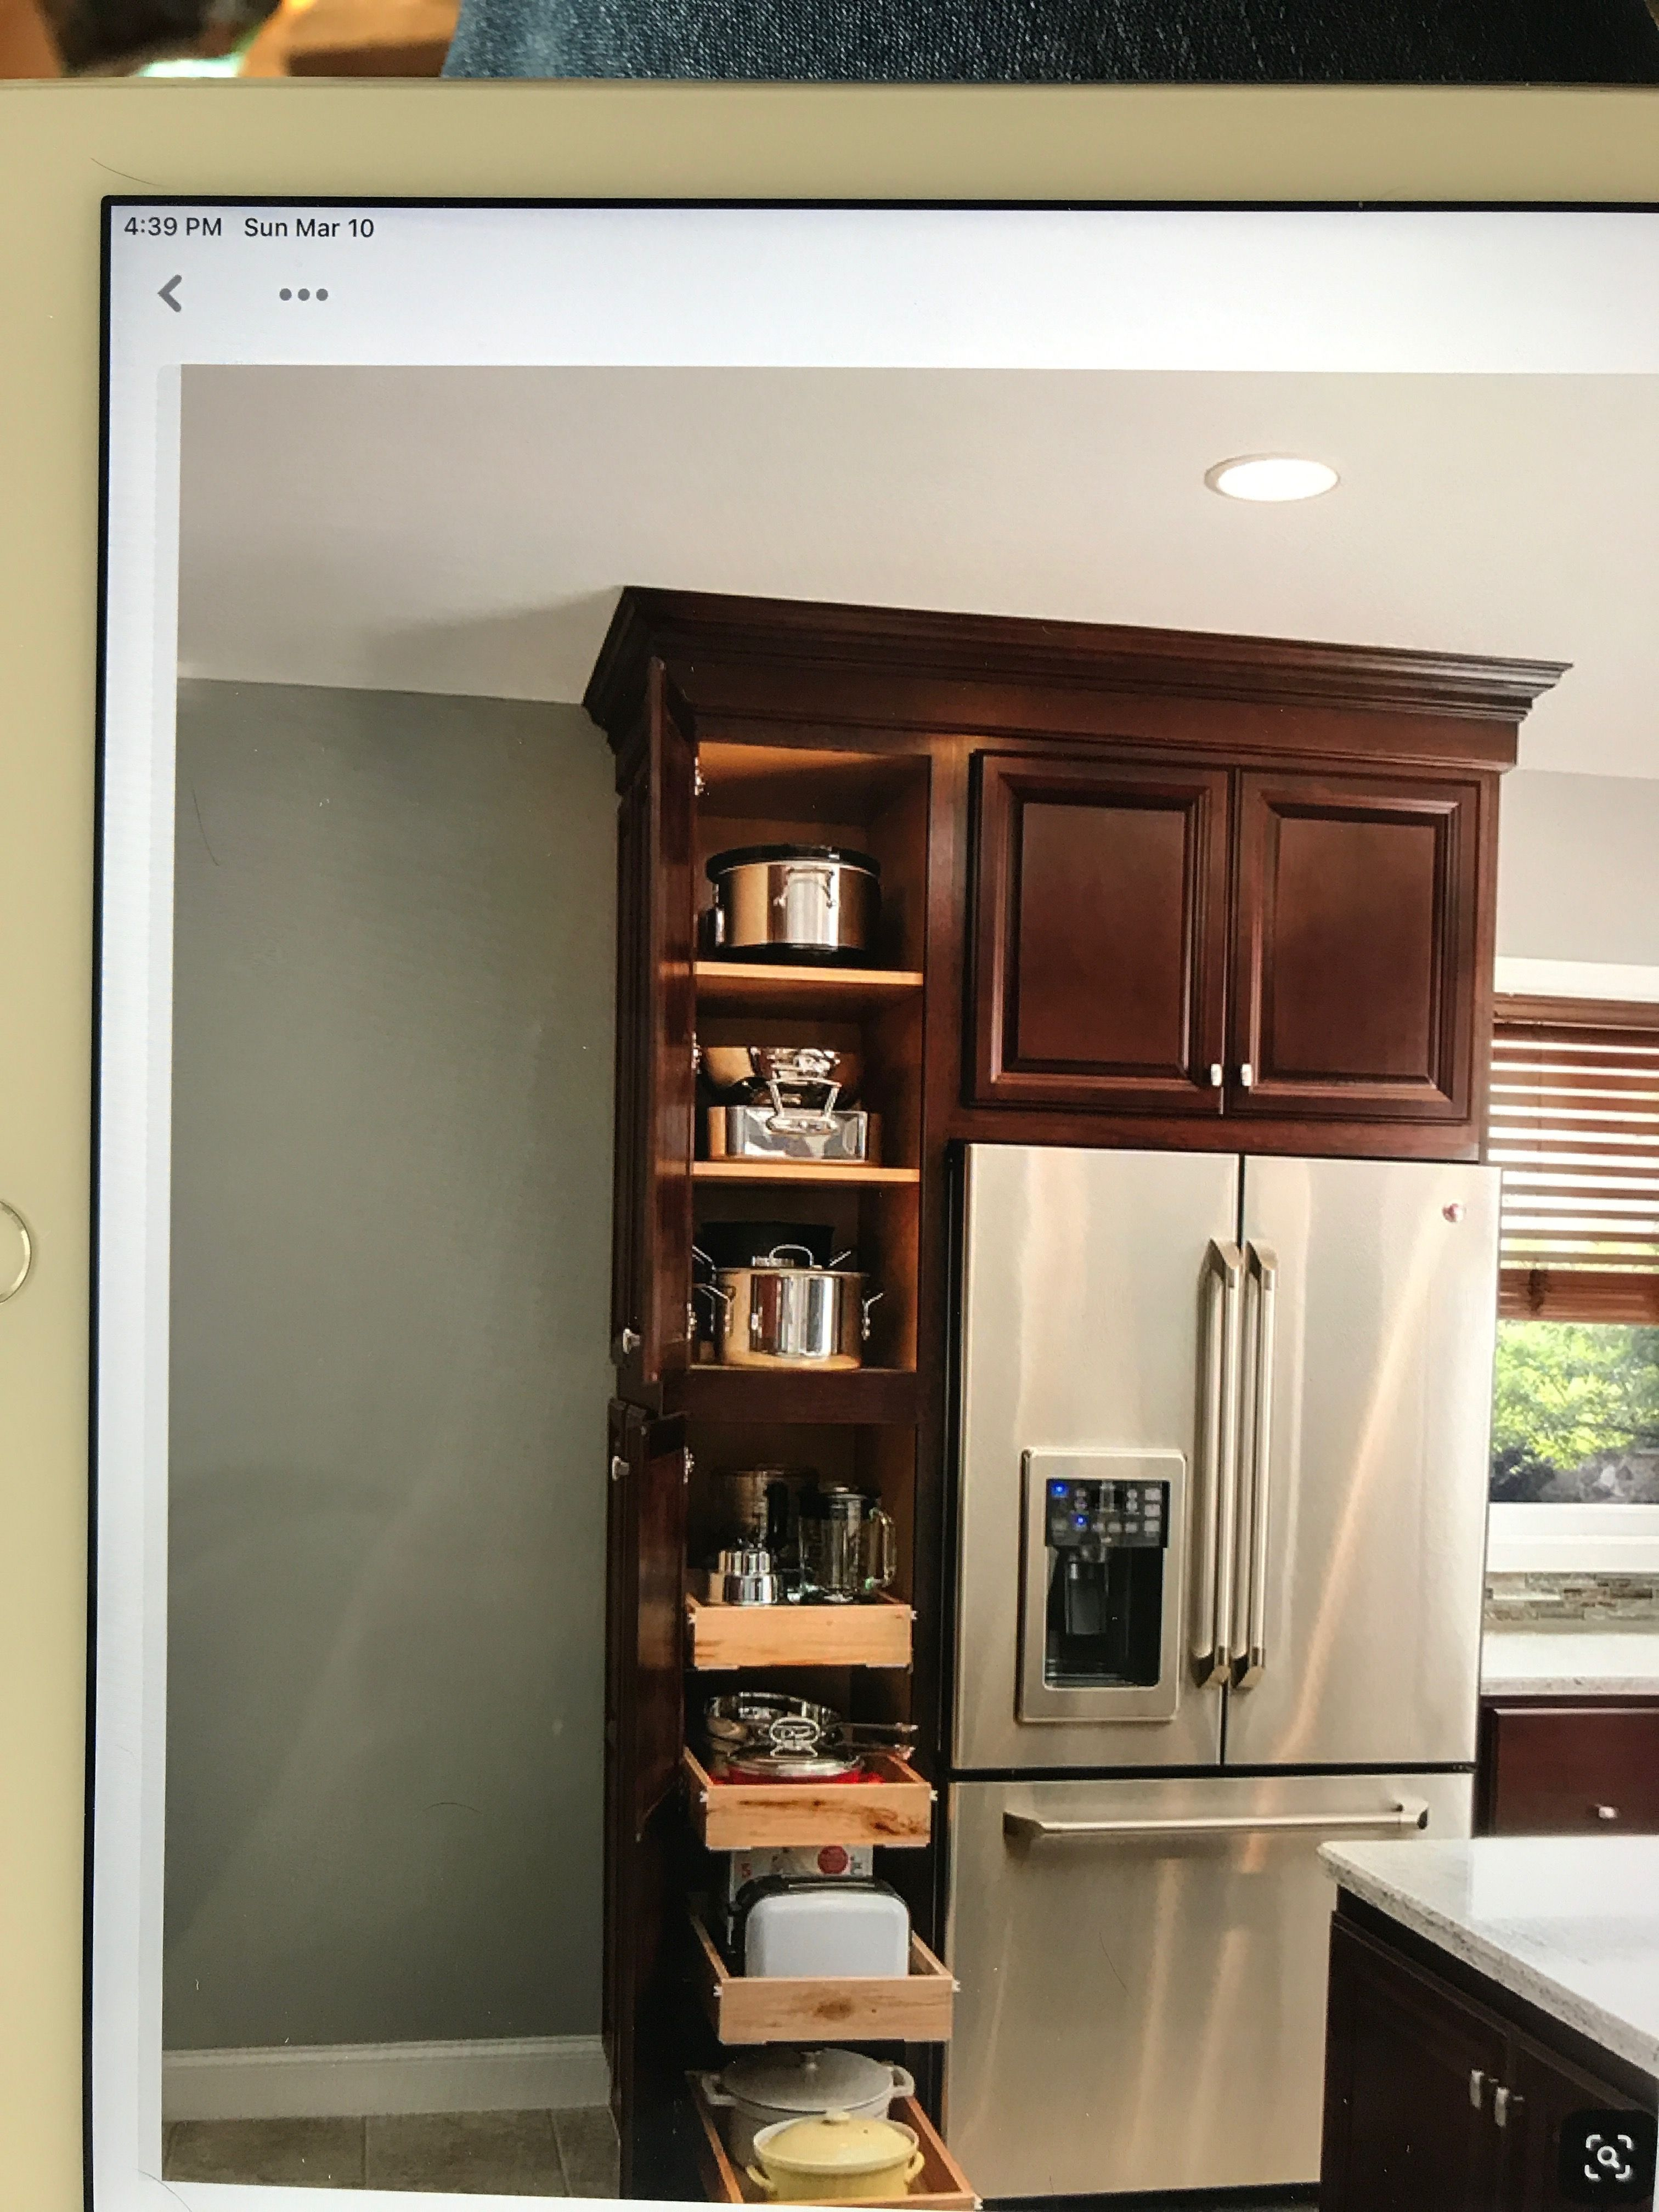 Pin by Arlene Reno on Kitchen in 2020 Kitchen, Home